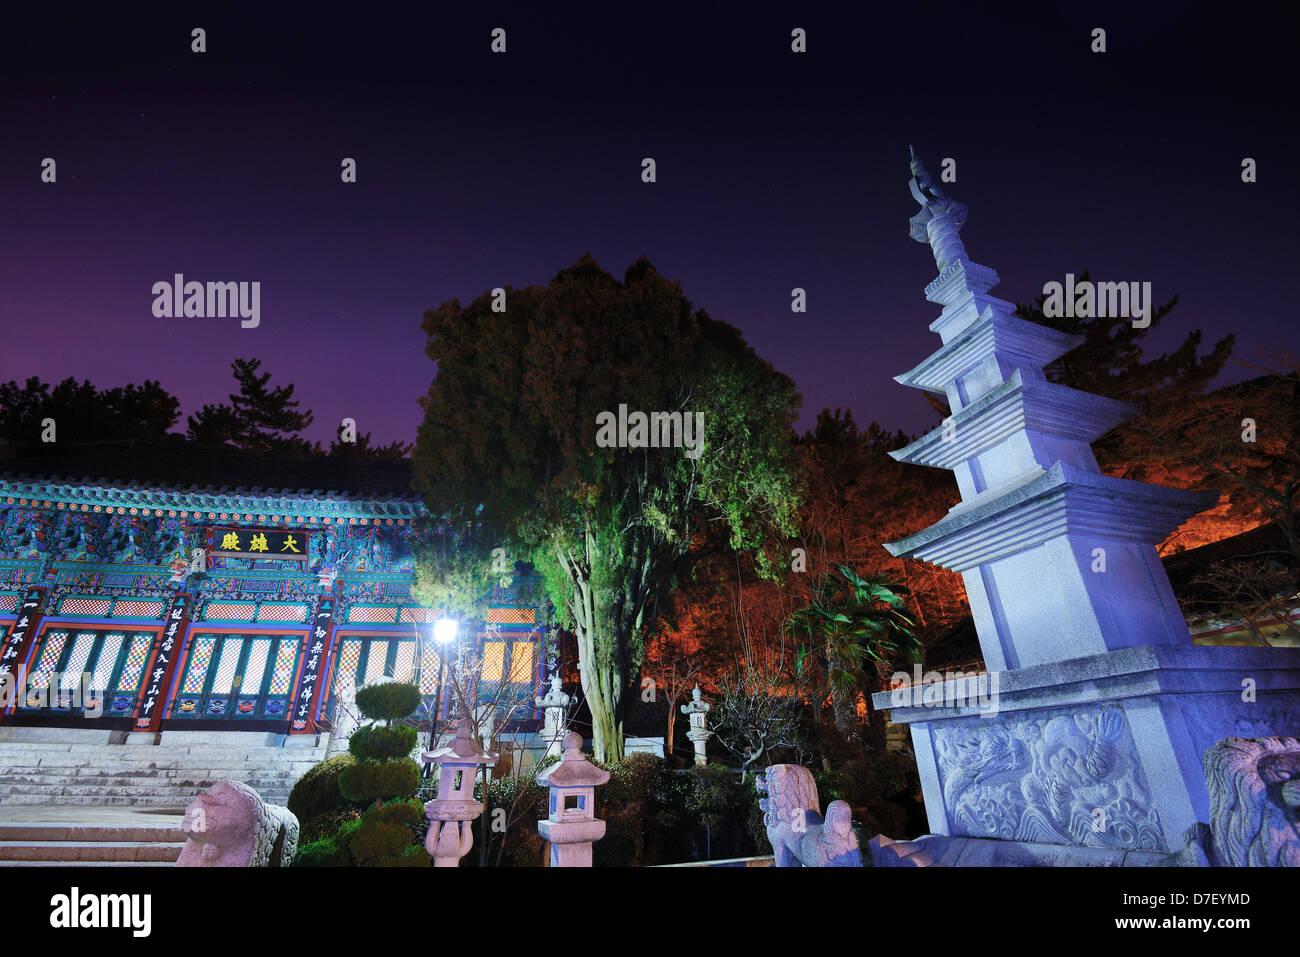 Pokposa Tempel am Fuße des Berges Jangsan in Busan, Südkorea Stockbild